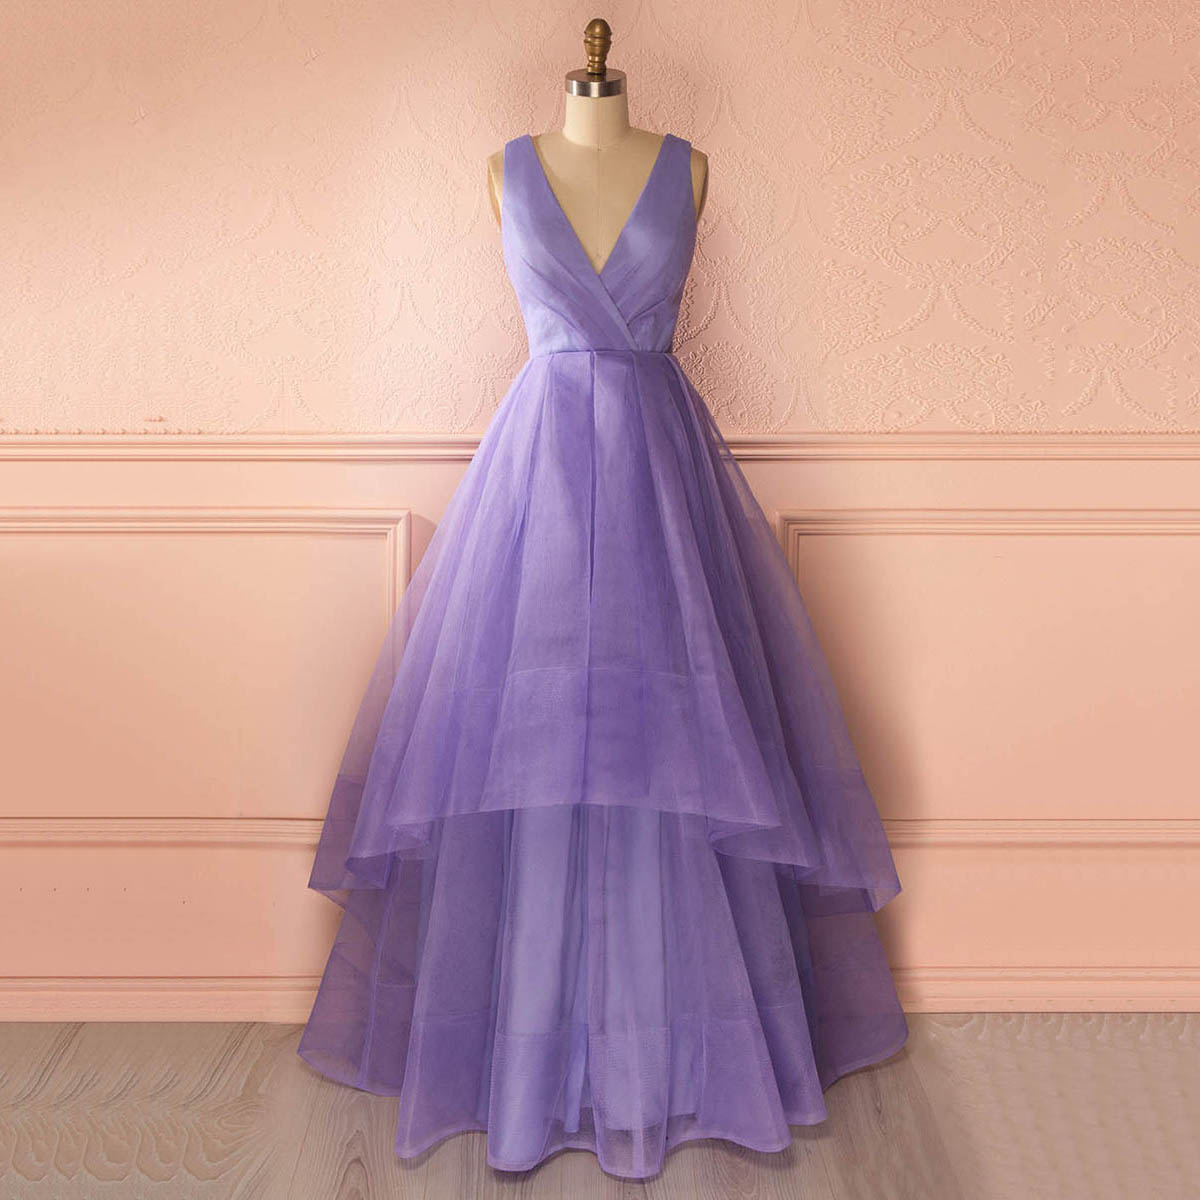 Unique Deep V Neck Floor Length Prom Dress, Lavender Organza ...